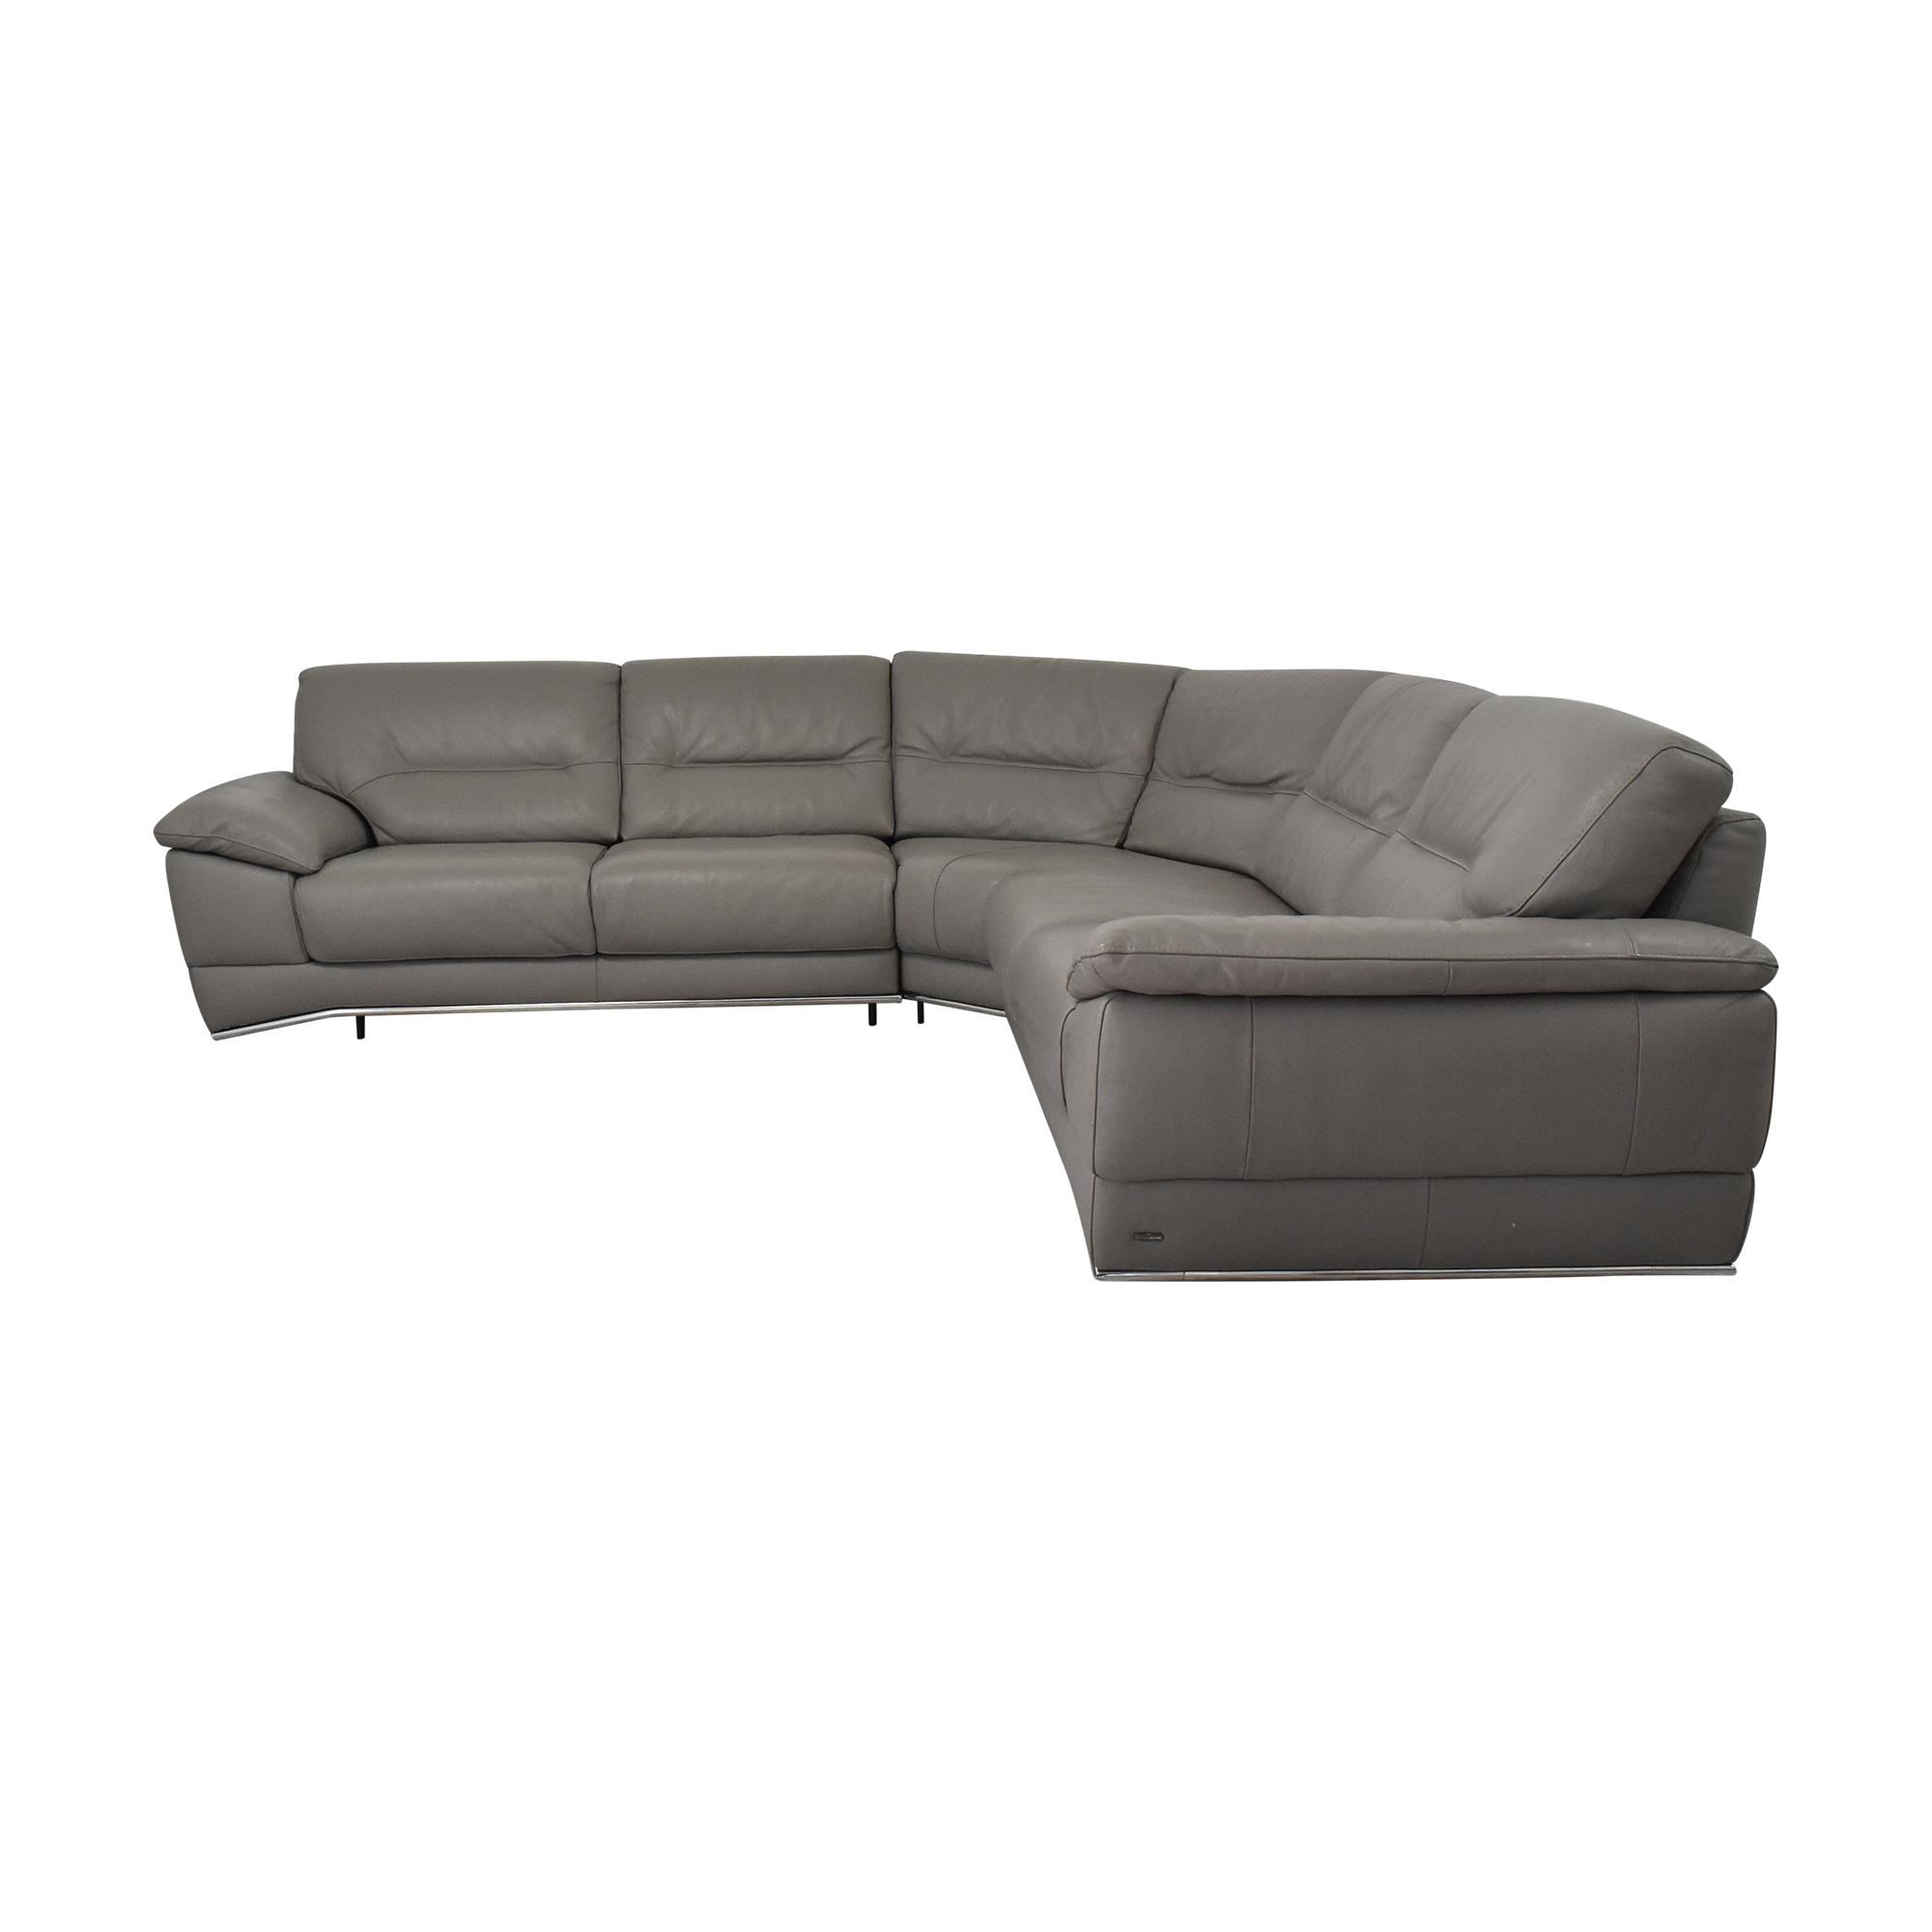 Natuzzi Natuzzi Corner Sectional Sofa dimensions